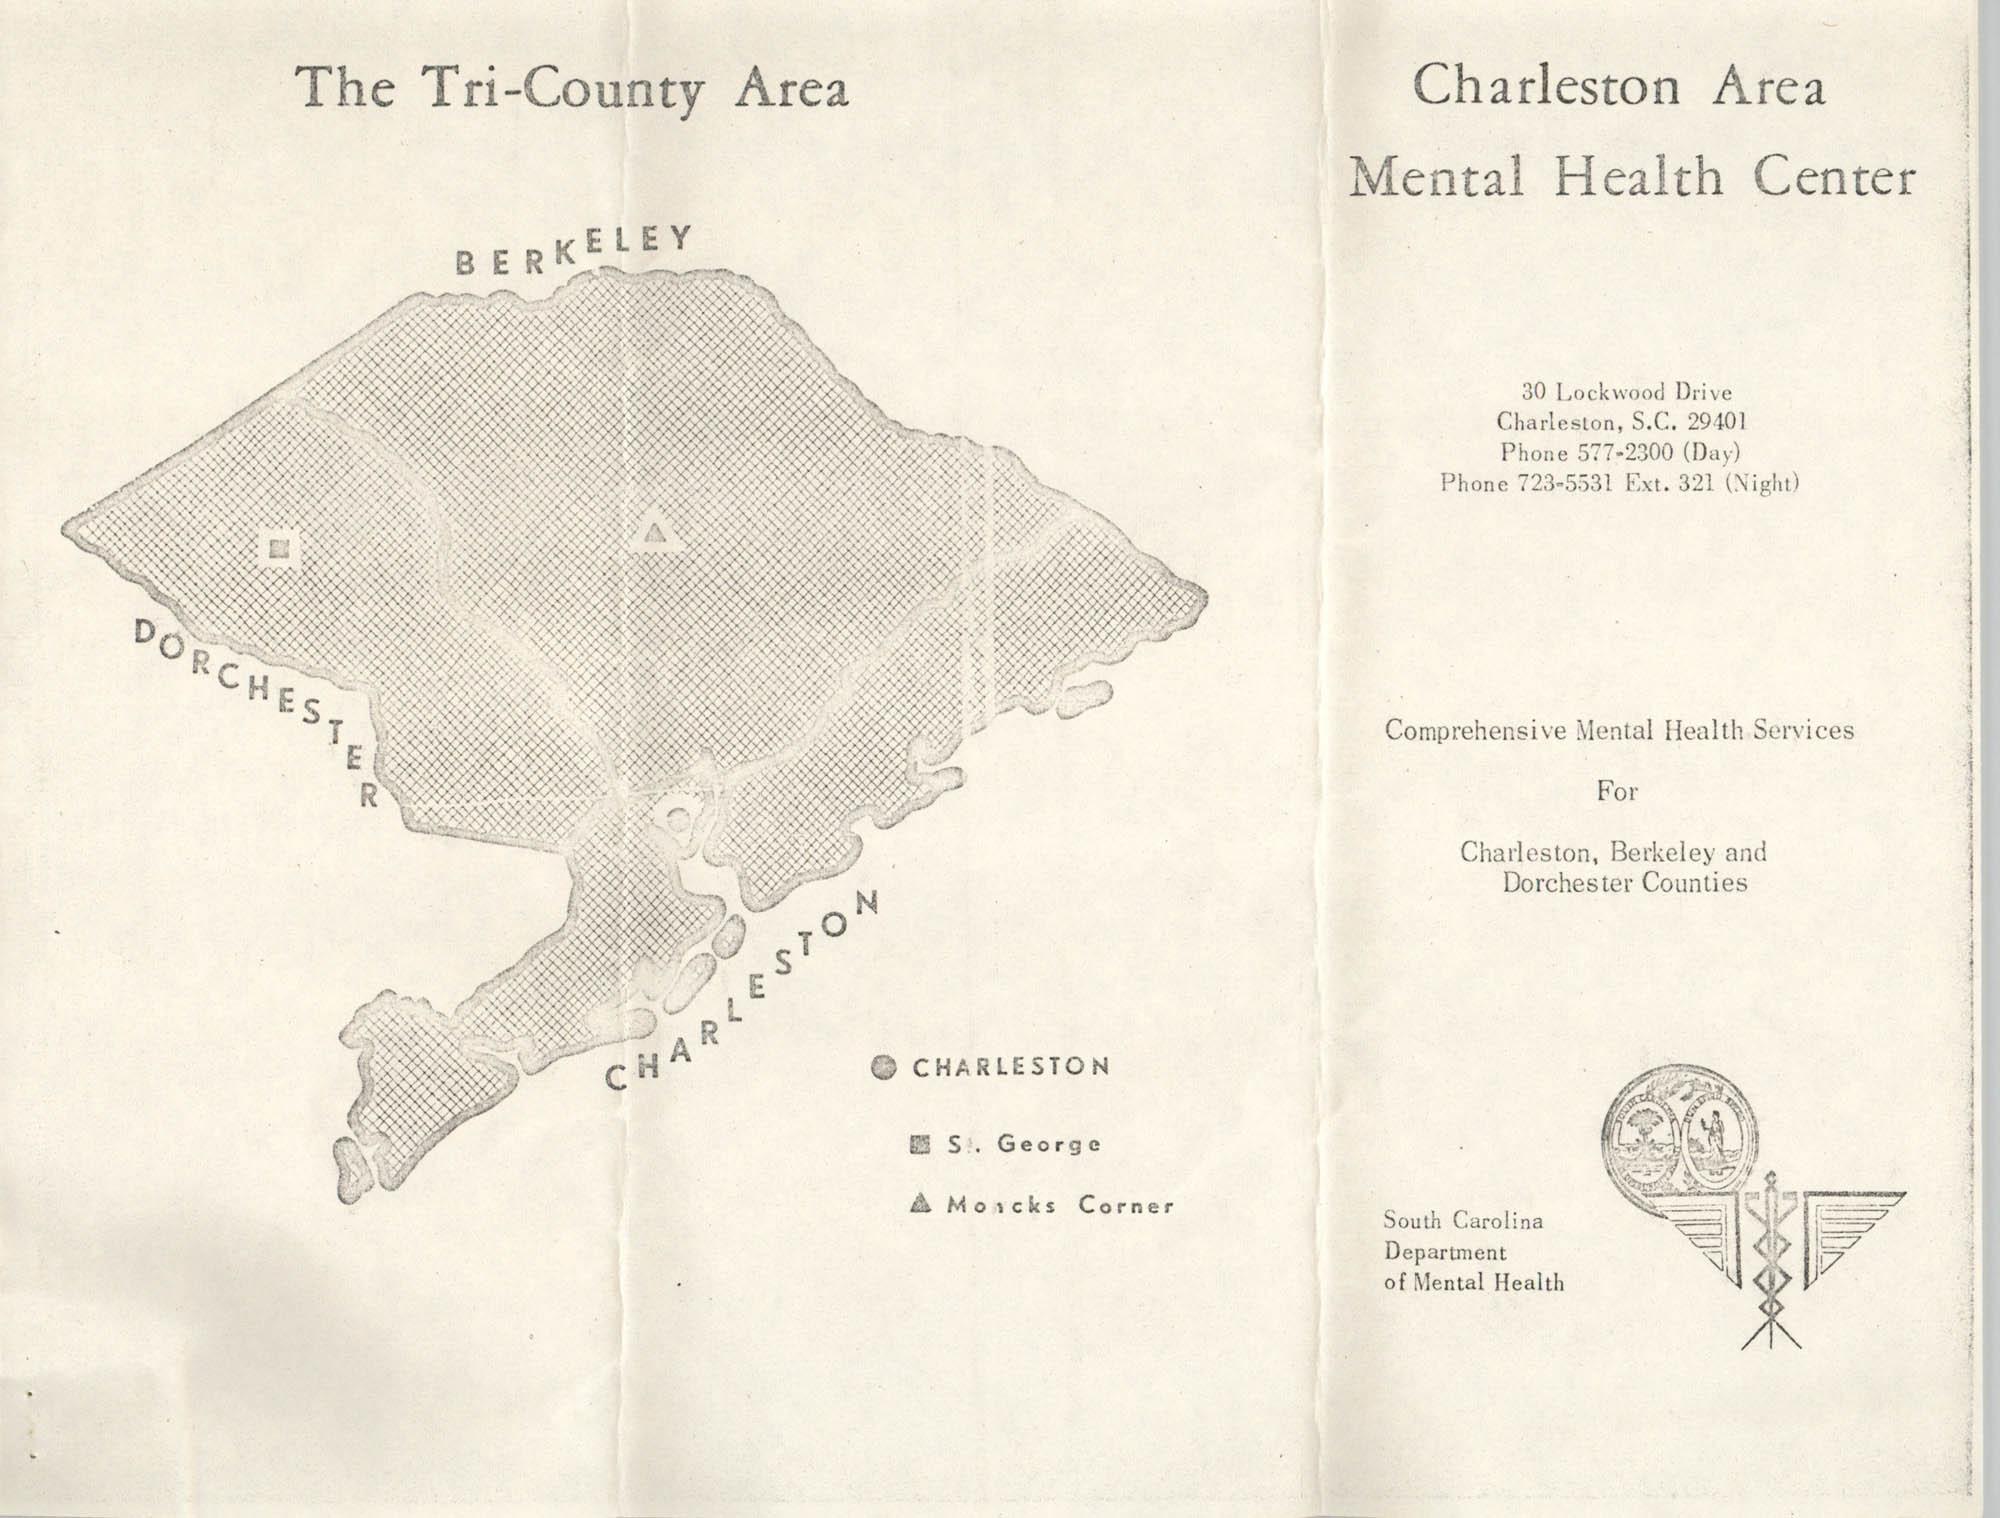 Charleston Area Mental Health Center Pamphlet